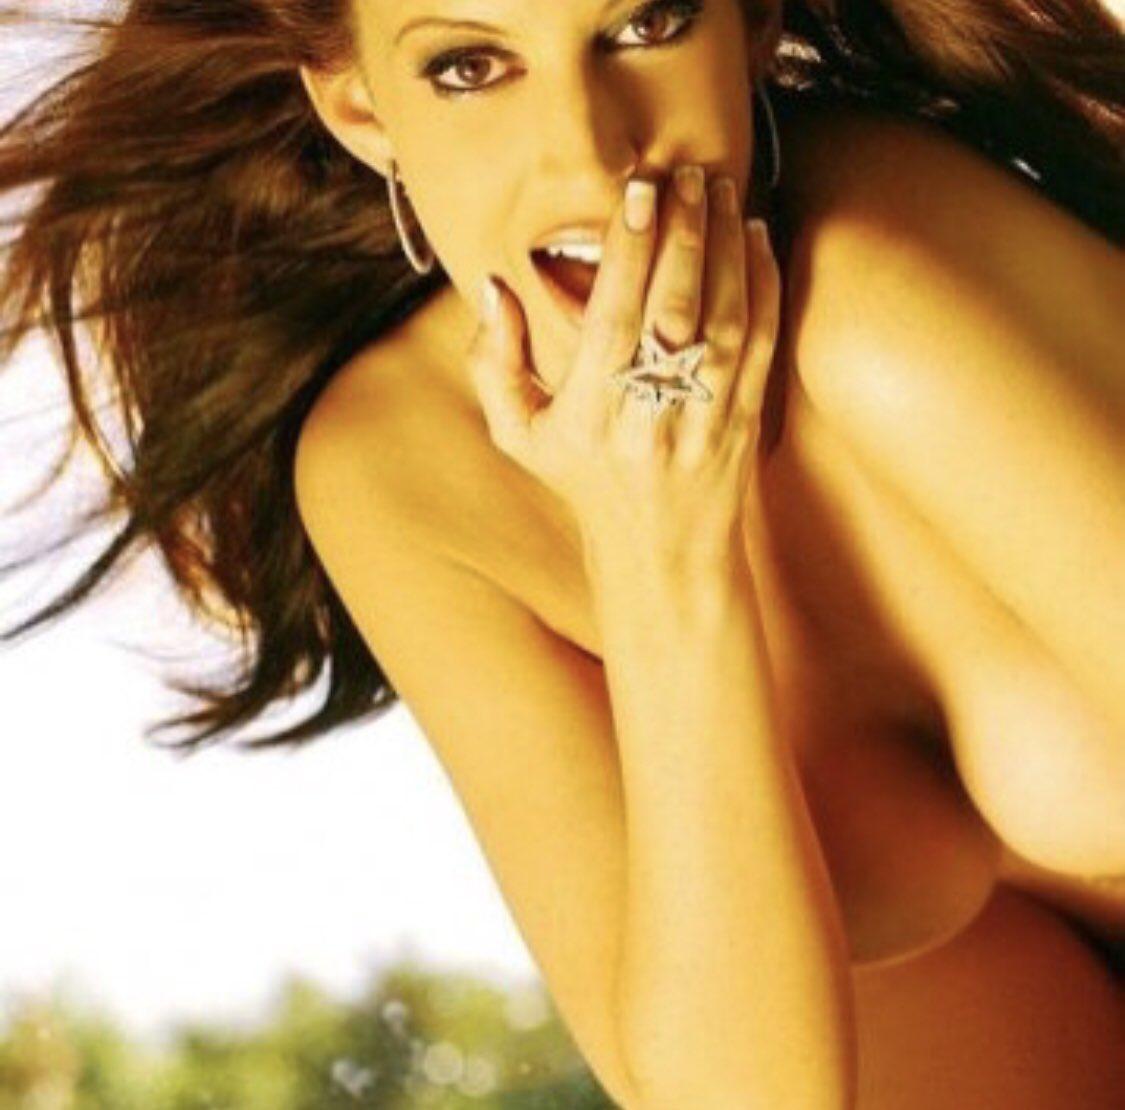 #flashbackfriday #nikkinova #model #losangeles #california MvtUCi4sX9